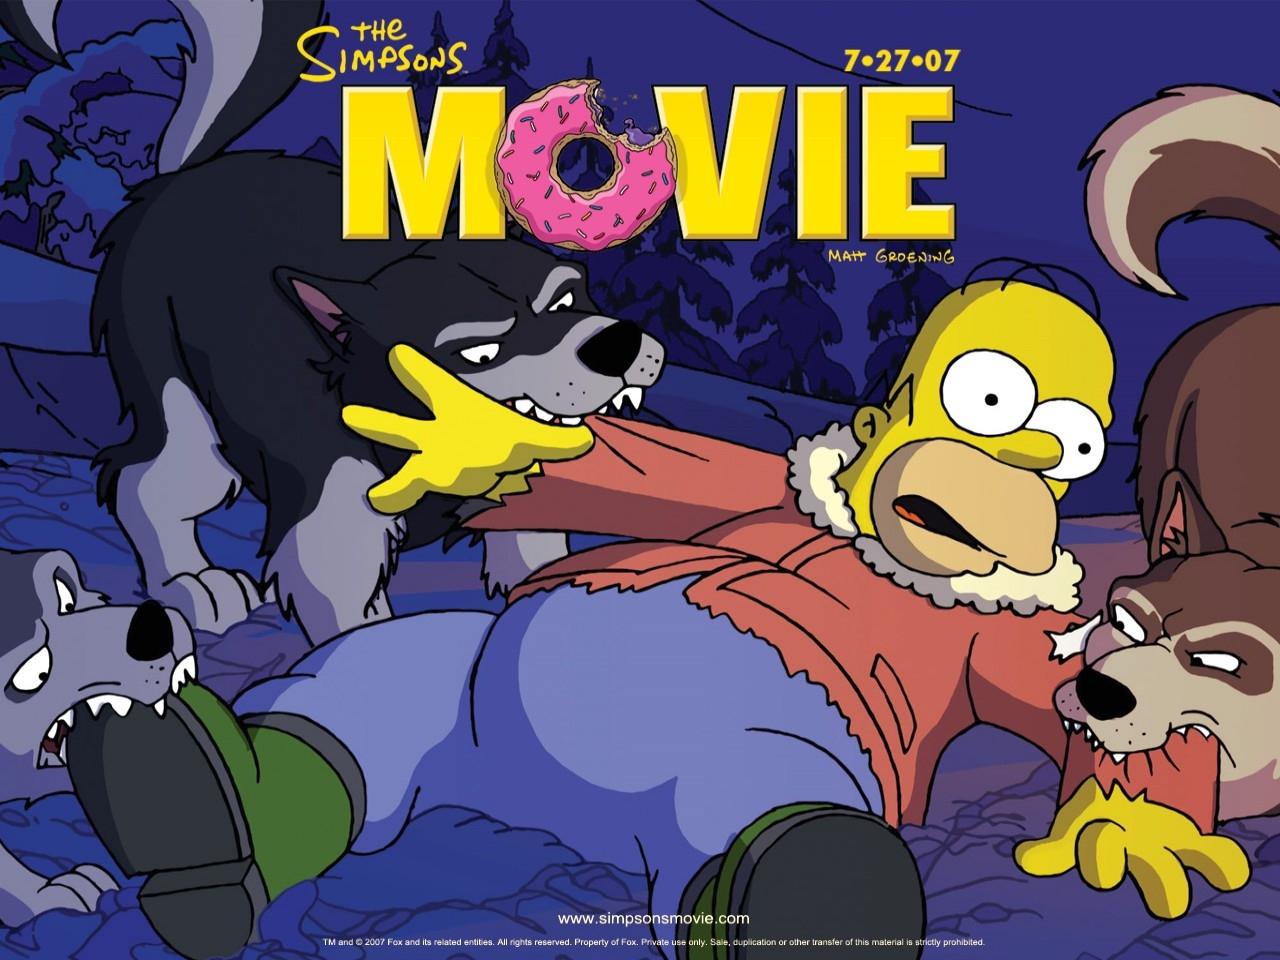 Desktop wallpaper del film I Simpson - il film